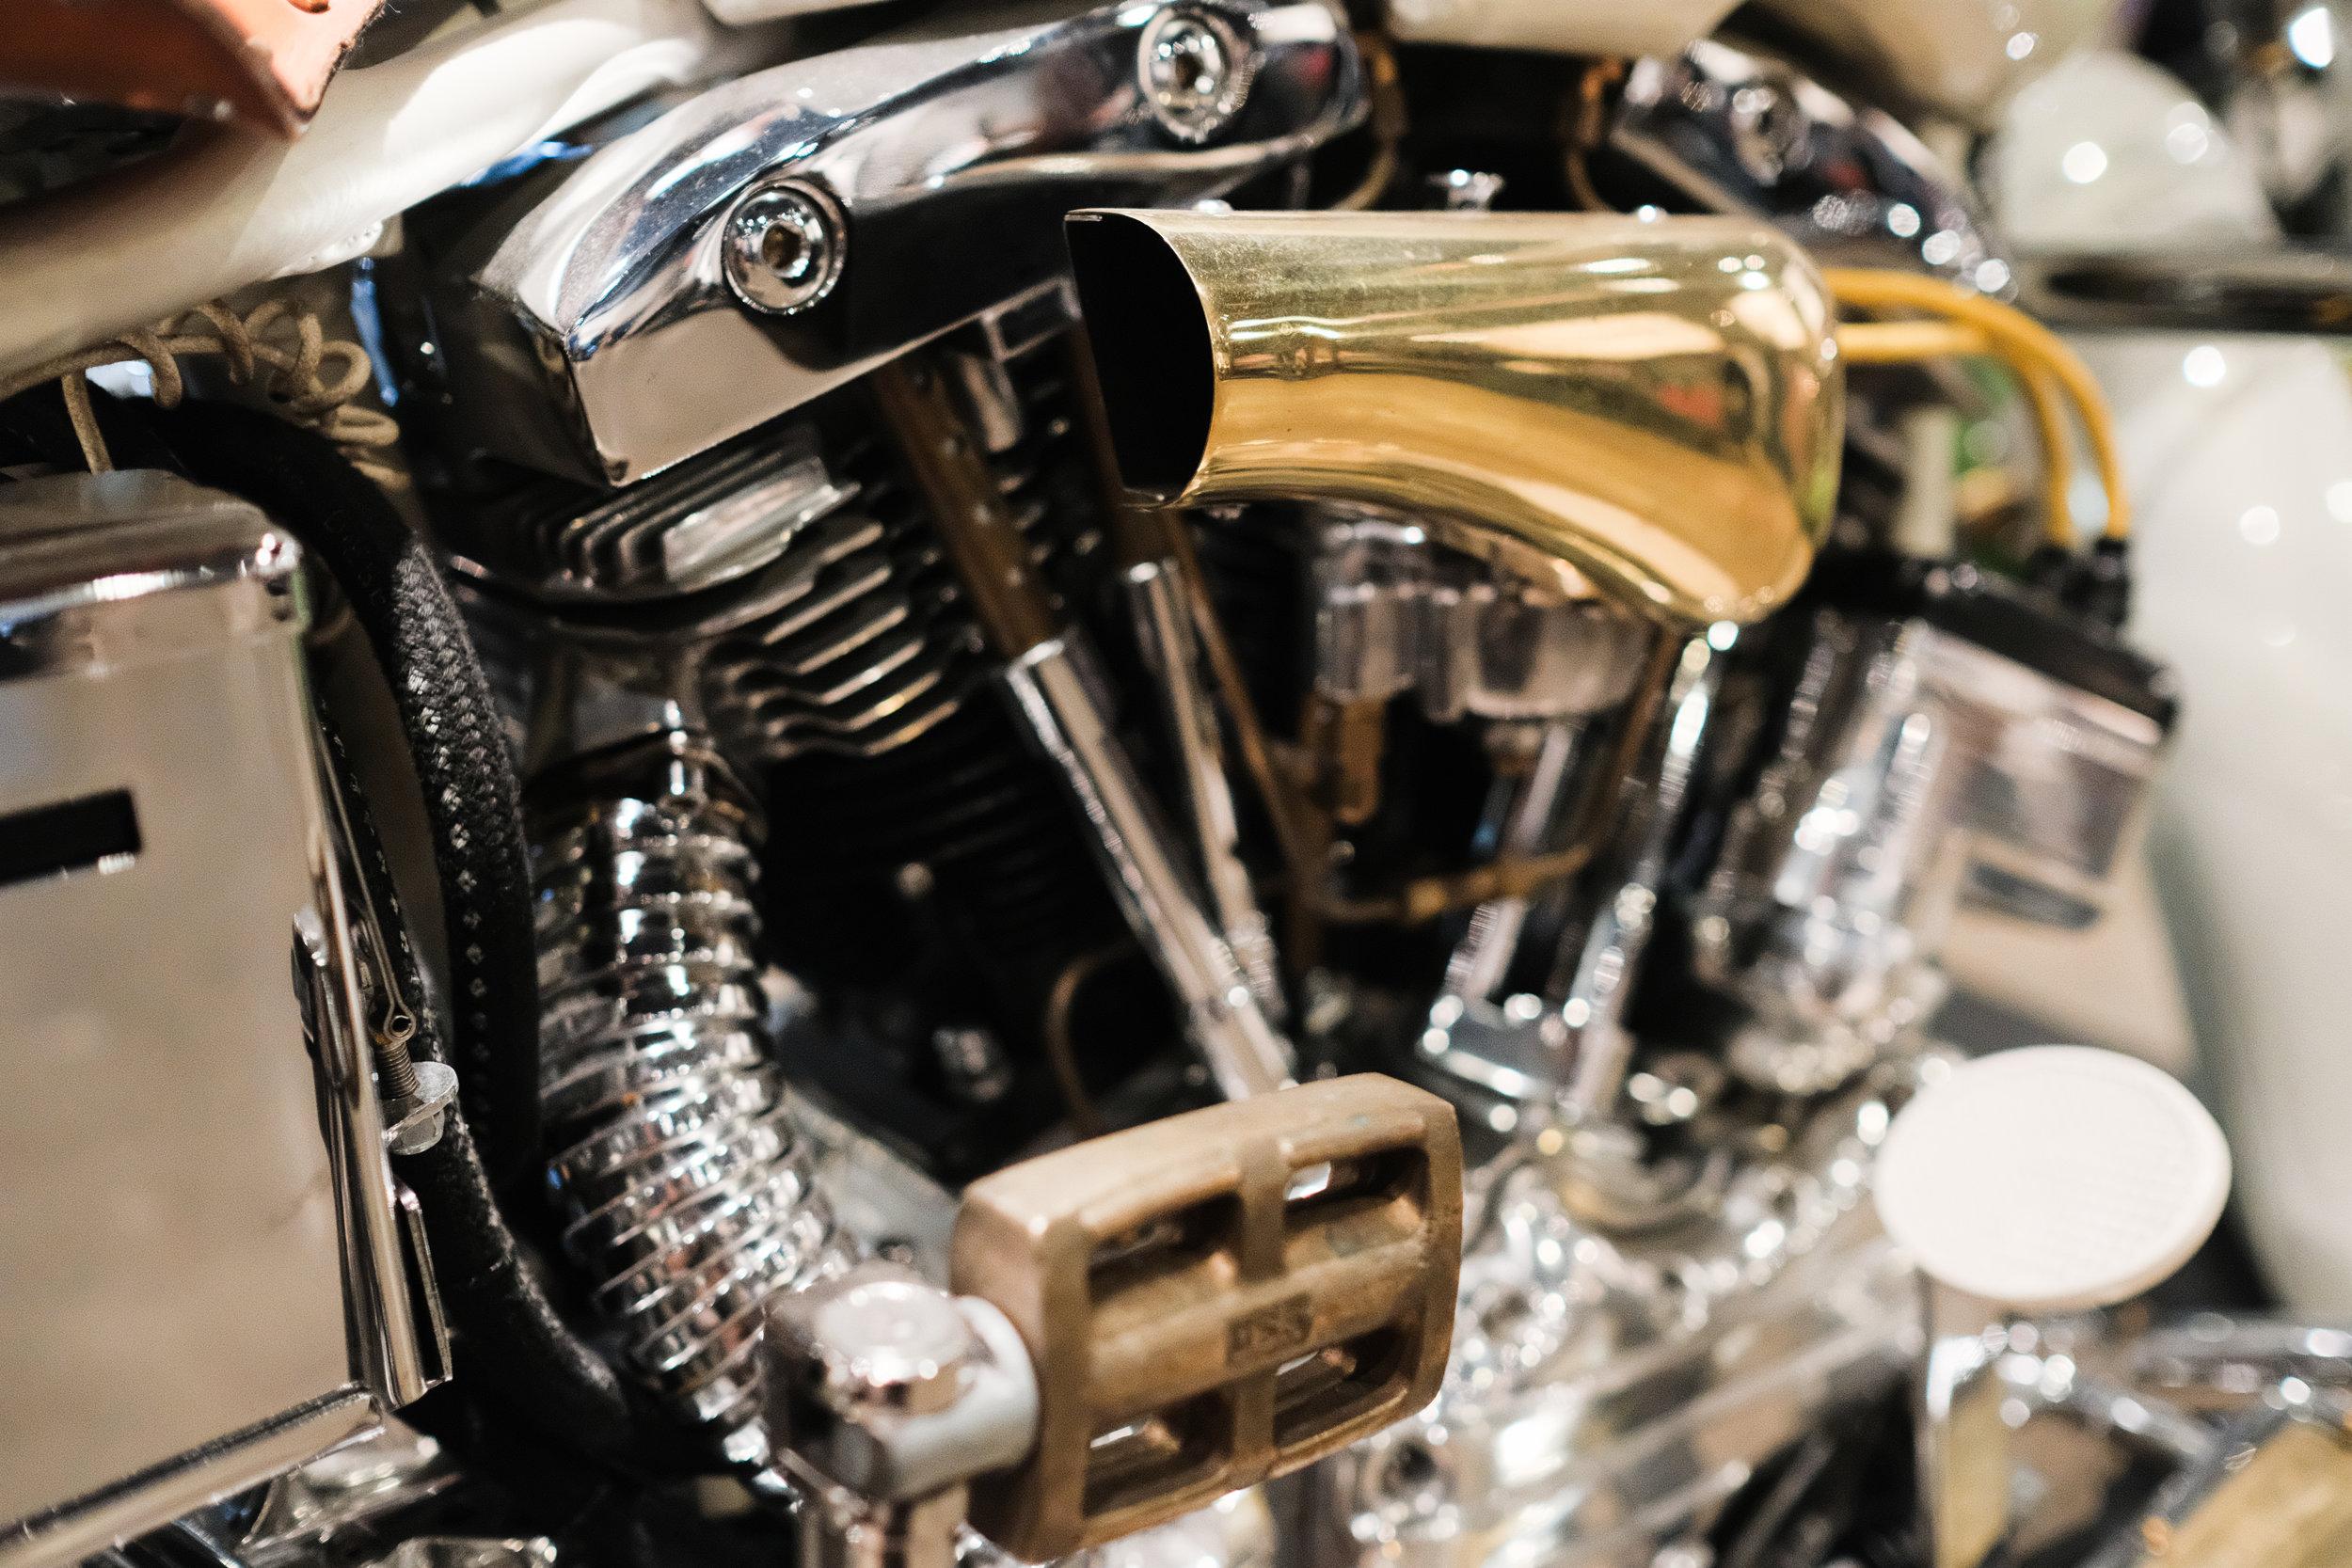 Handbuilt-Motorcycle-Show-2017-8738.jpg